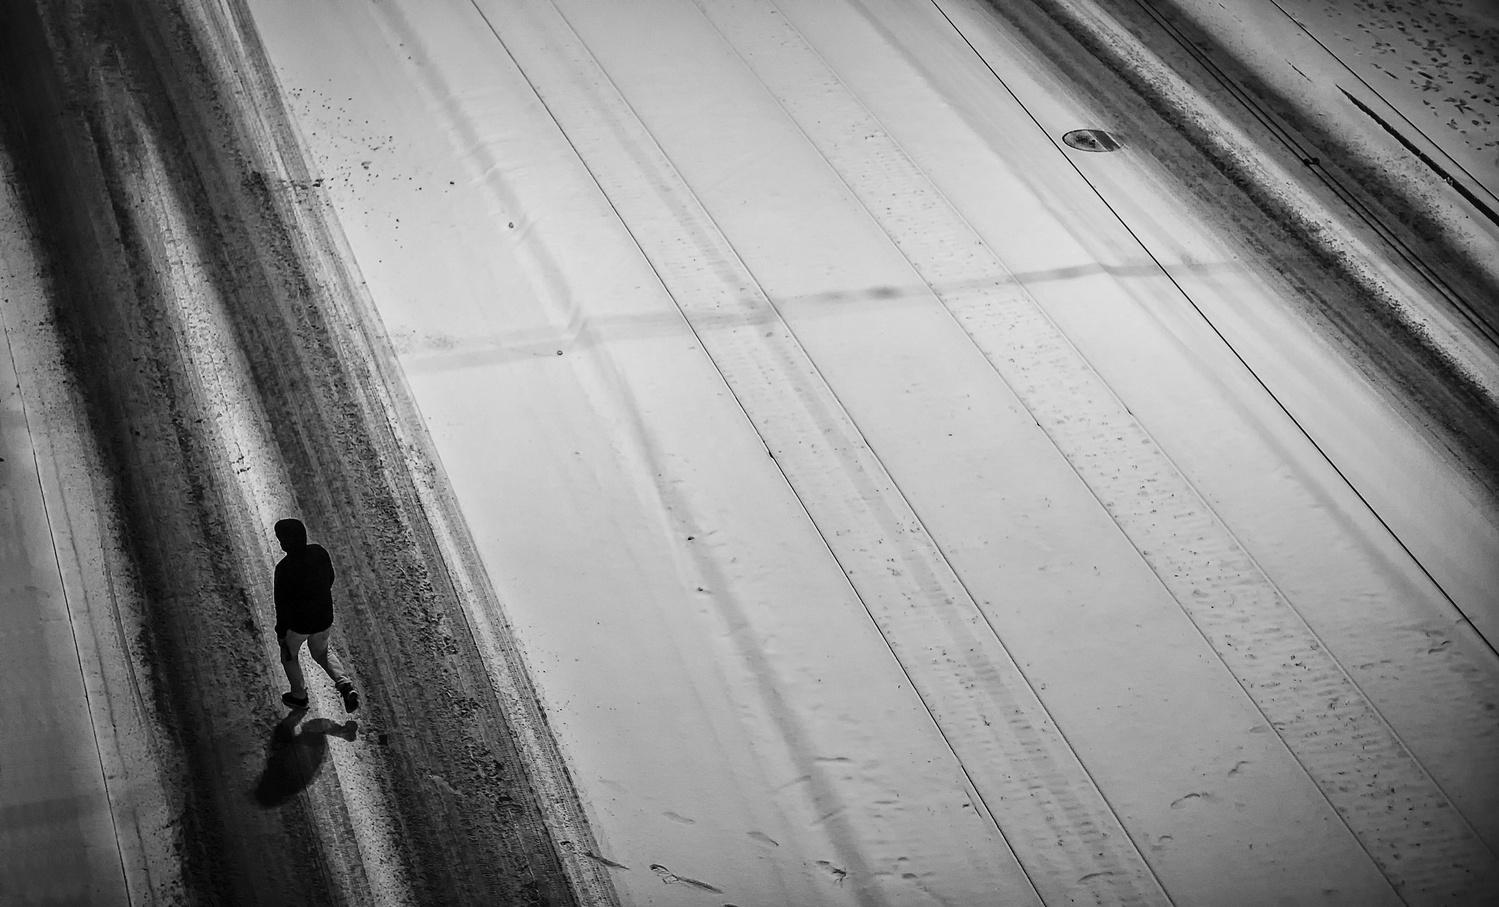 crossing by ver sus